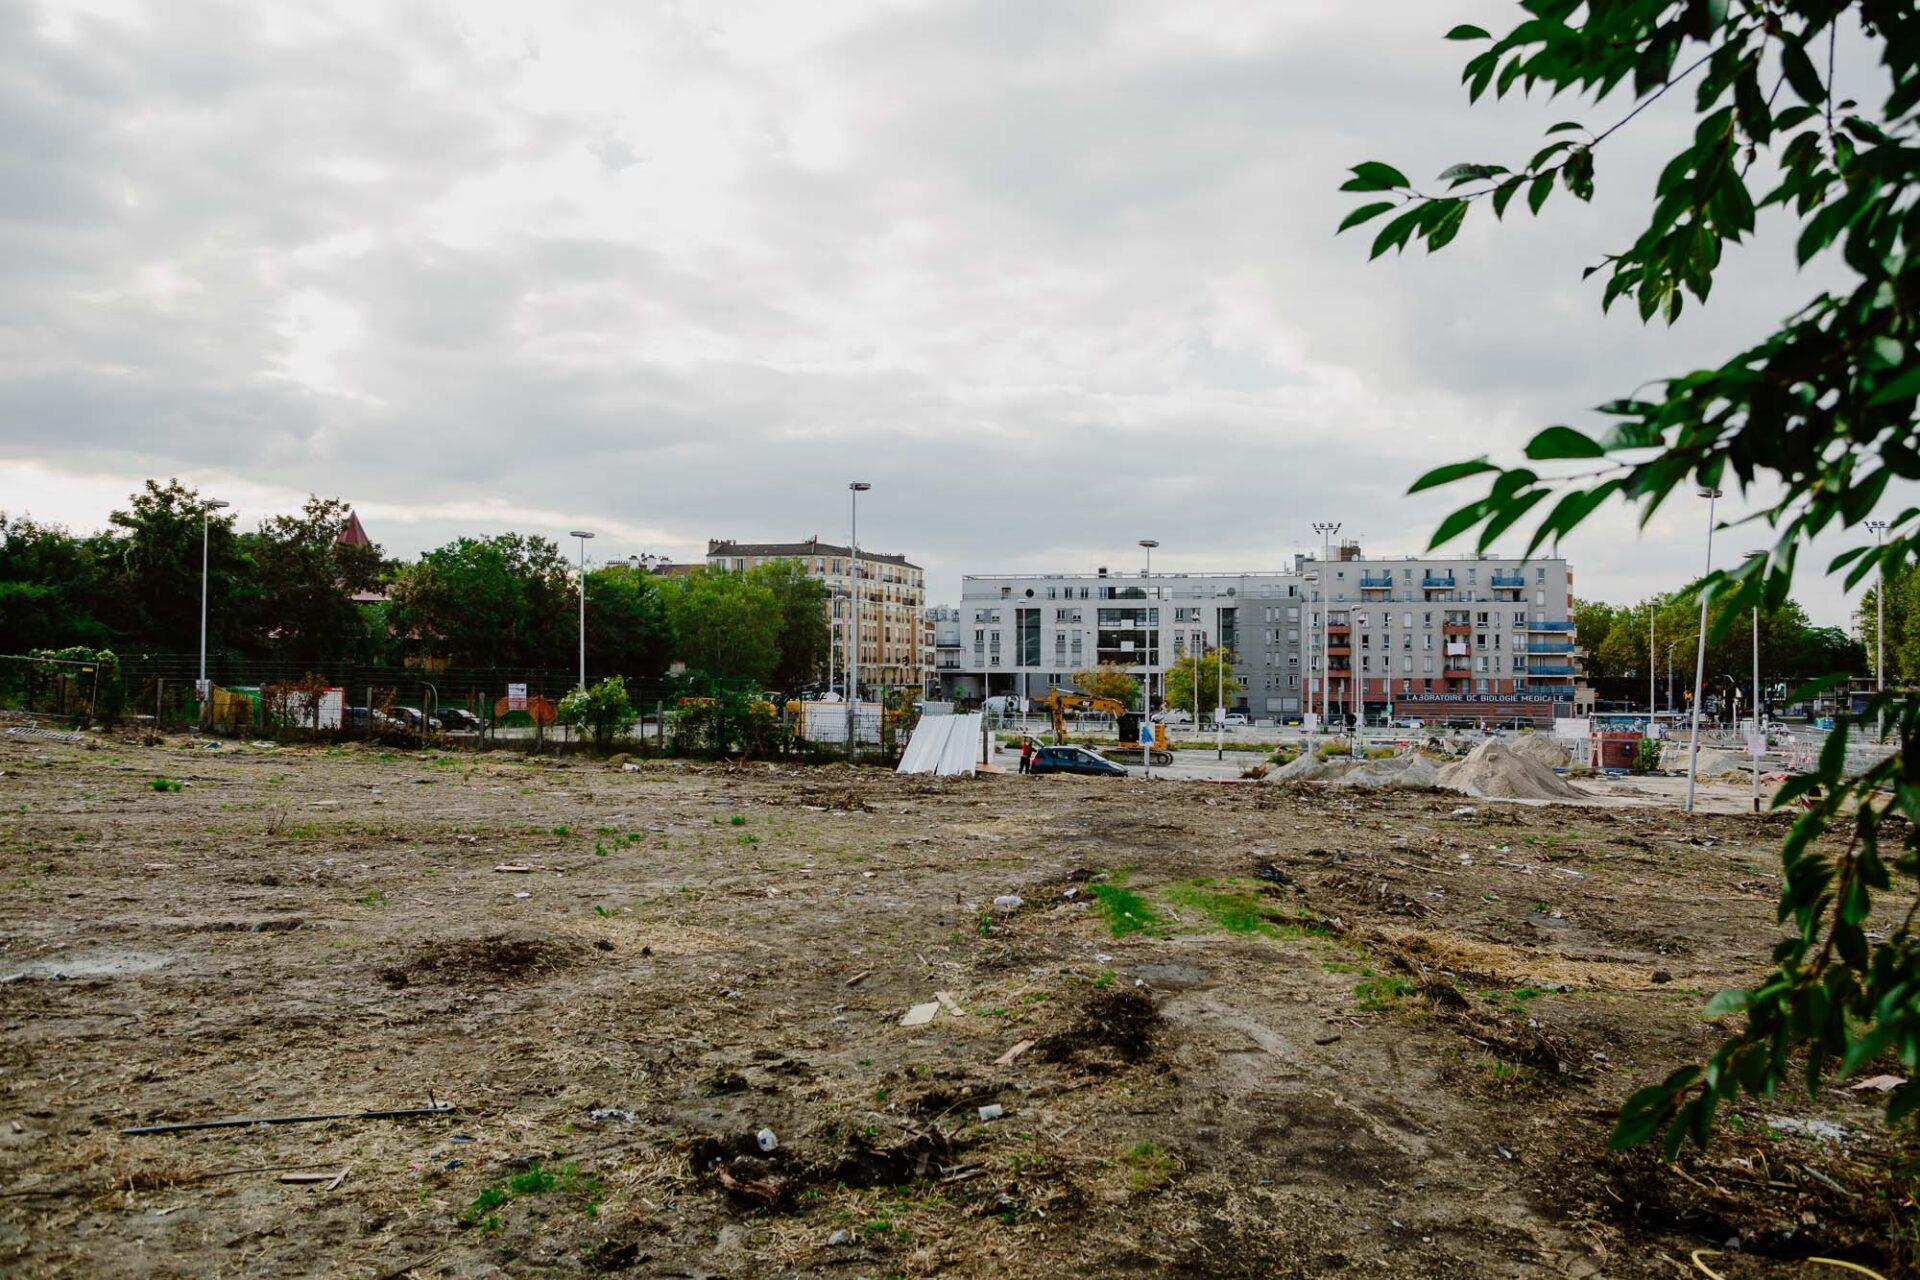 Jardins ouvriers aubervilliers 17 - Dagmara Bojenko - Eco-conscious Weddings, Births & Families